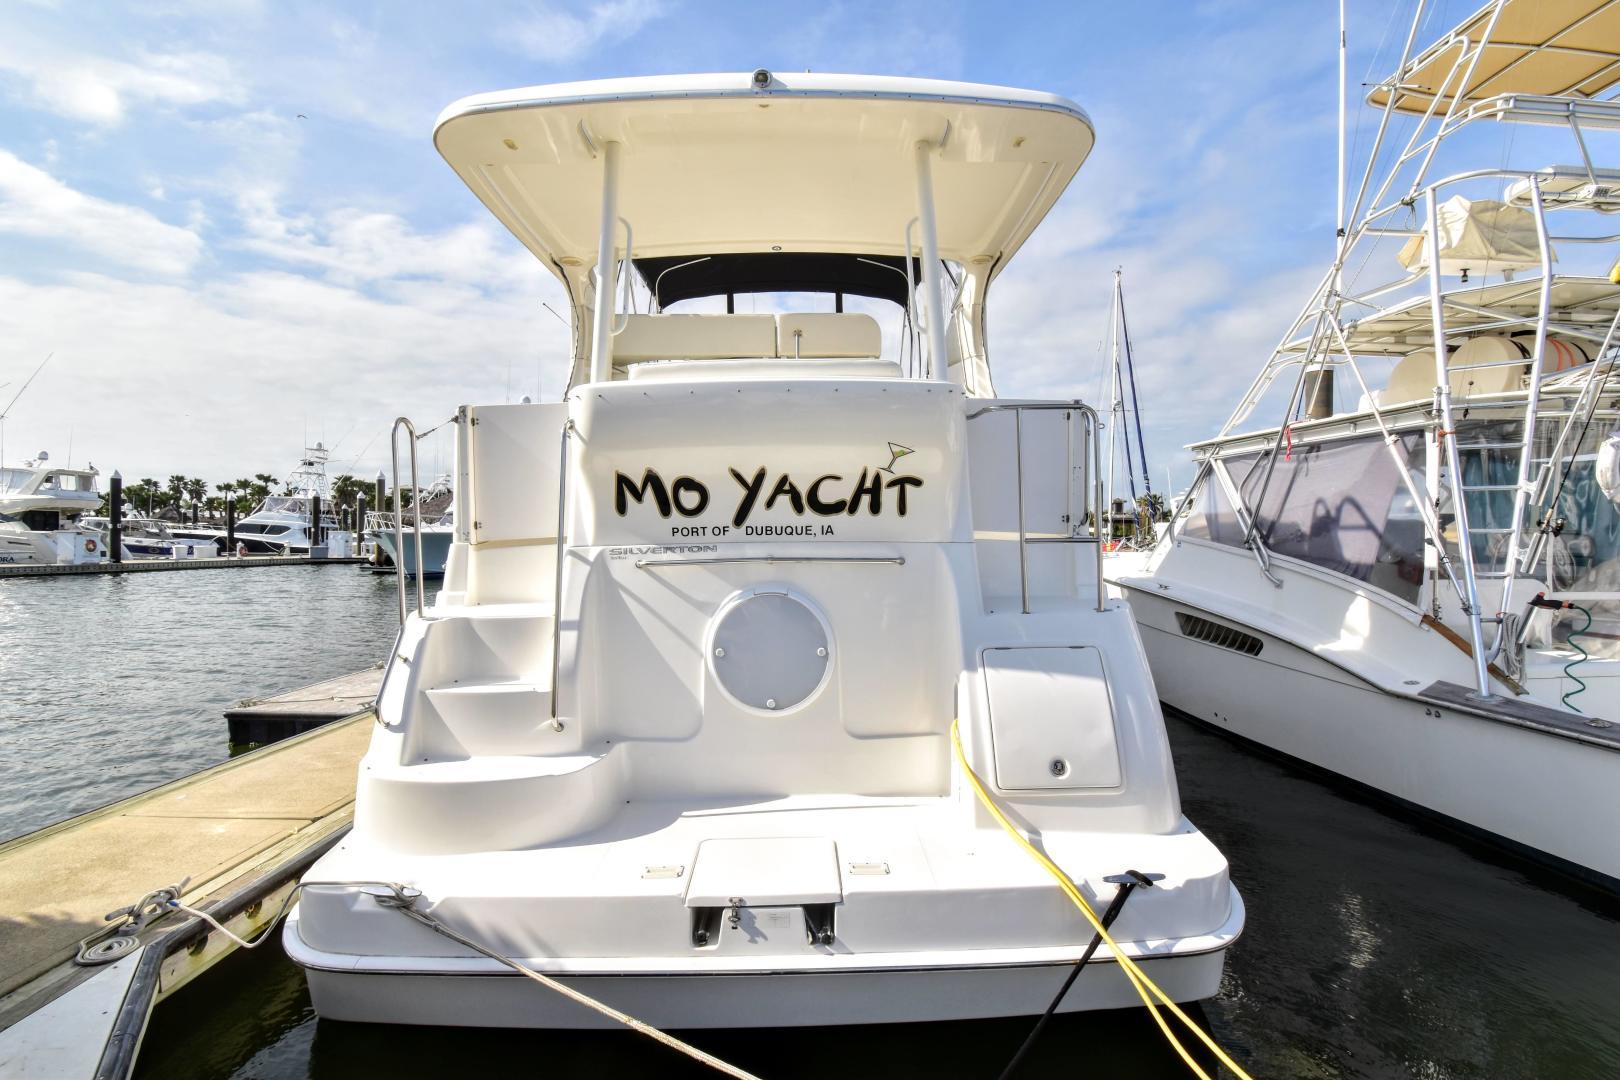 Silverton-35 Motor Yacht 2004-Mo Yacht Galveston-Texas-United States-Silverton Motor Yacht 2004 Mo Yacht-1356305 | Thumbnail